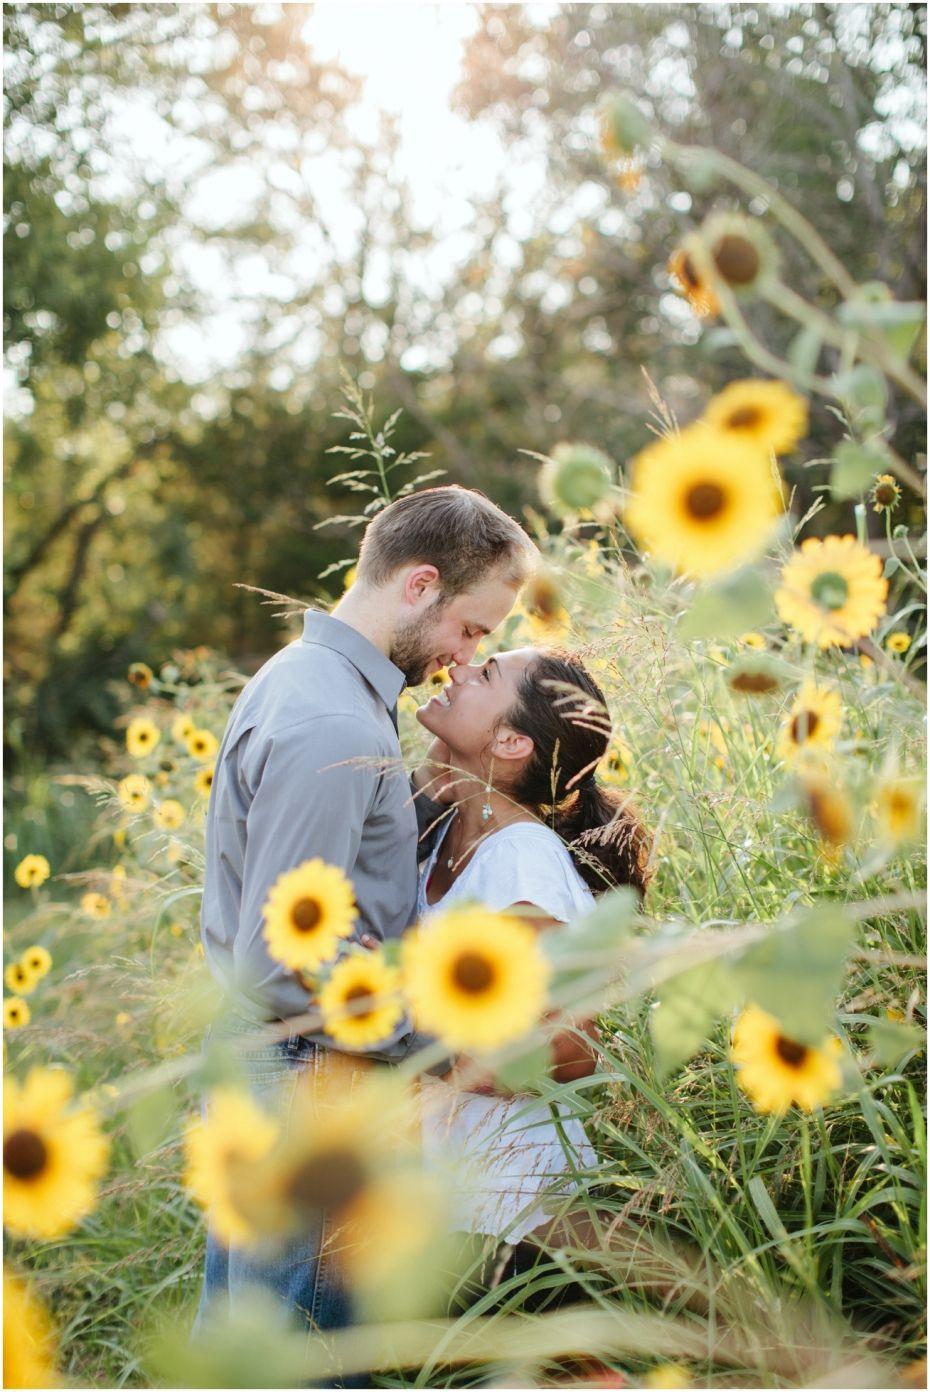 Noelito Flow Engagement pictures, Engagement couple